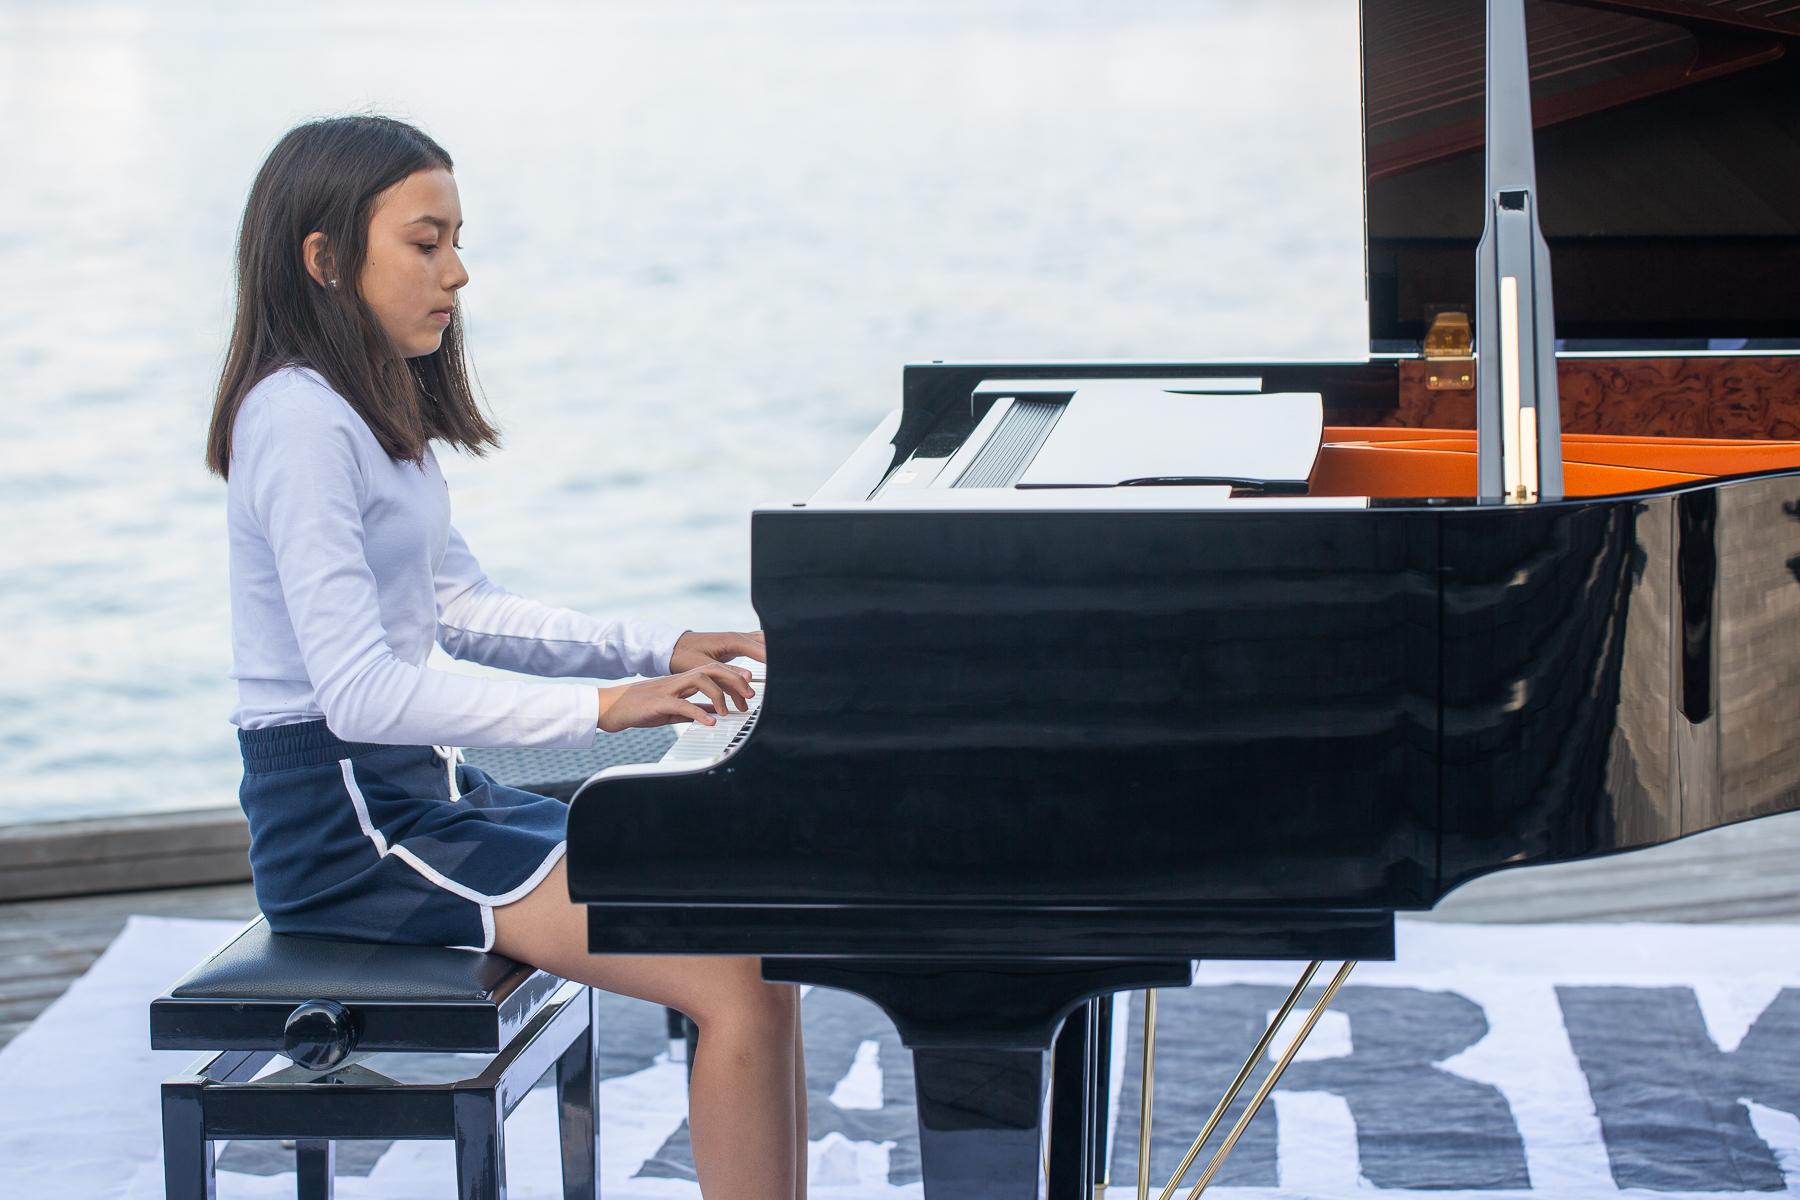 Parkert Piano_23 24 25 aug_@jonasmeek-58.jpg